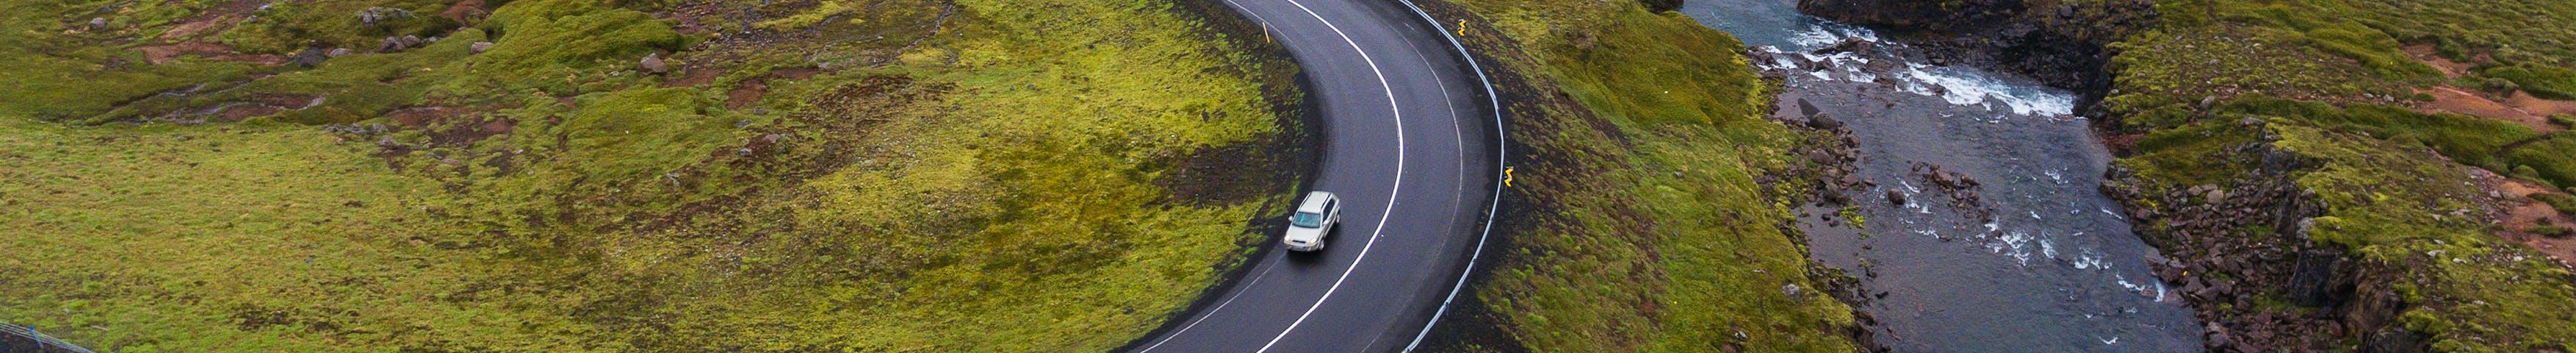 Viaggi Self Drive